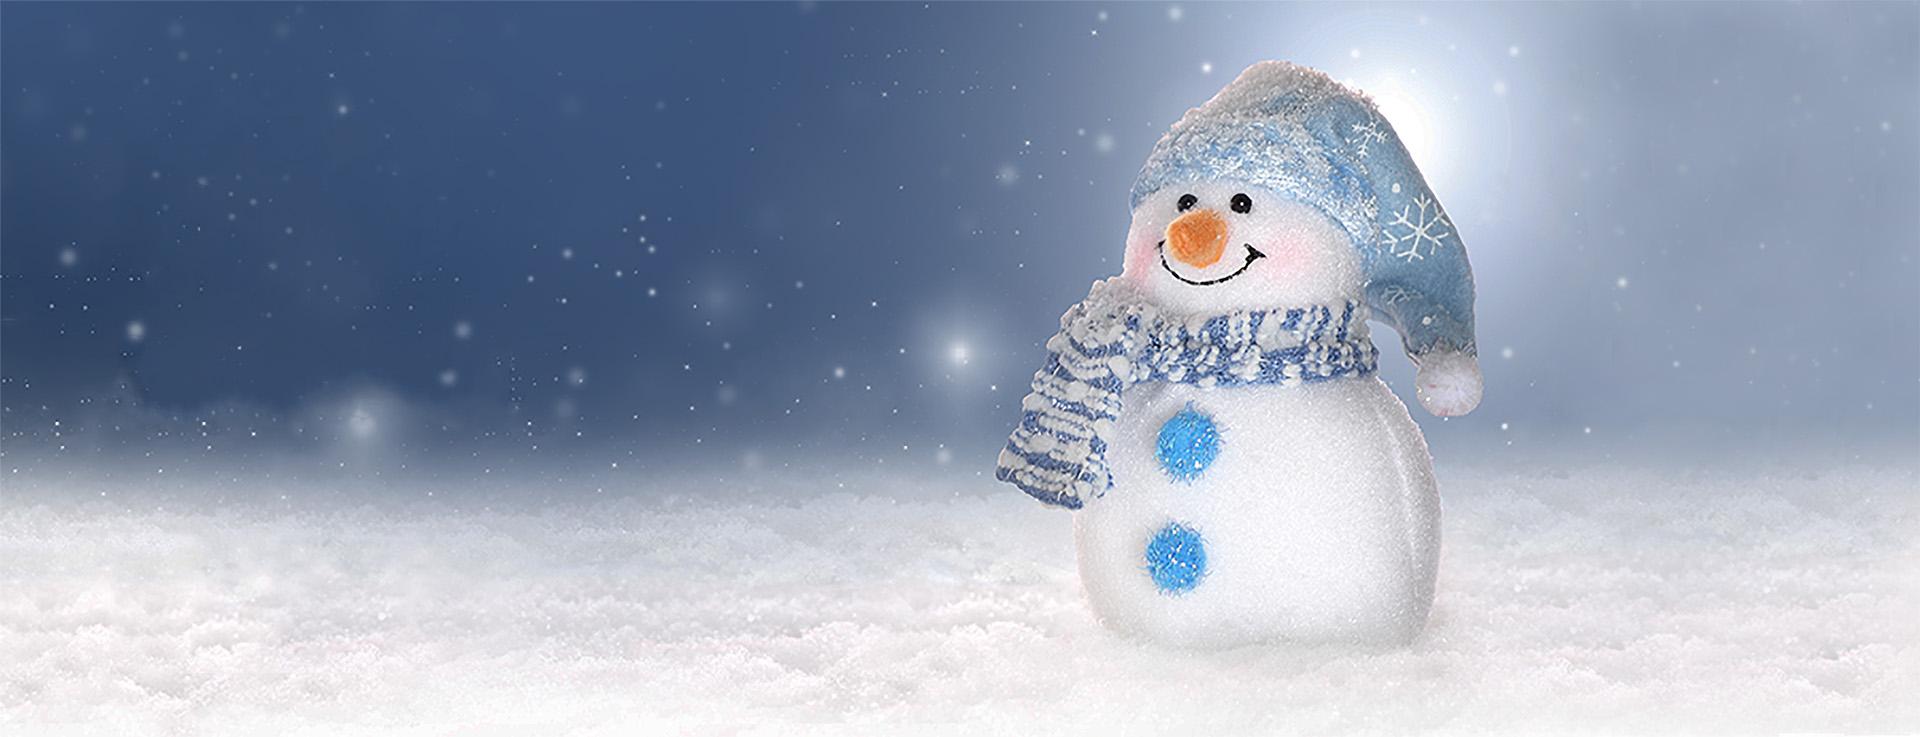 Snowman Resize new 1920x737